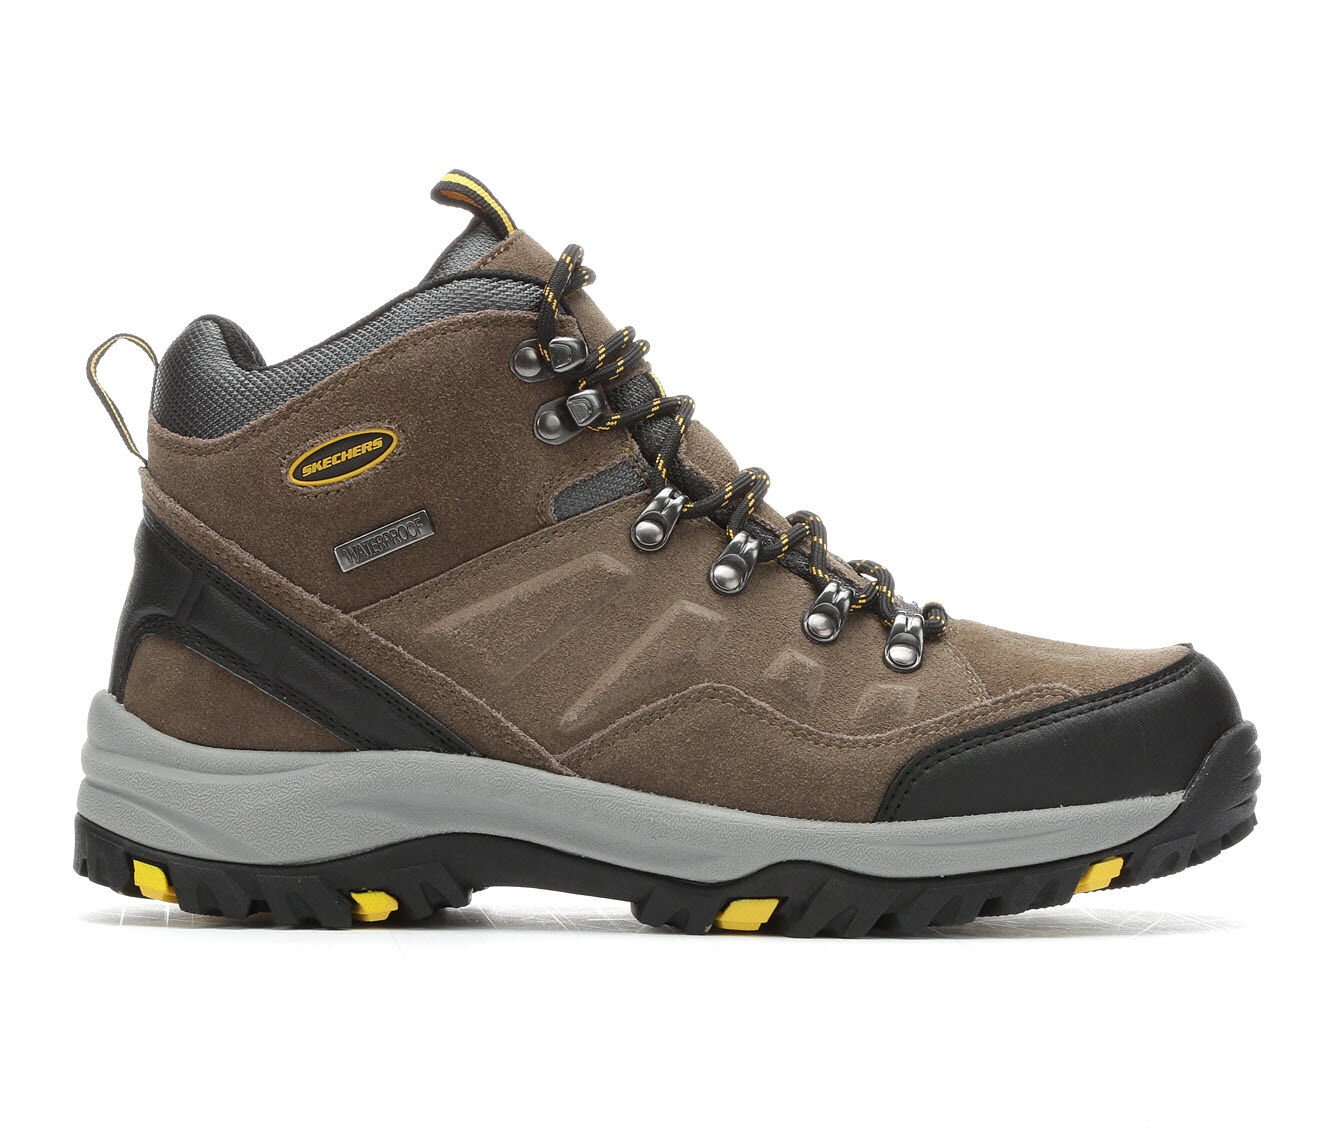 Men's Skechers Pelmo 64869 Hiking Boots Khaki